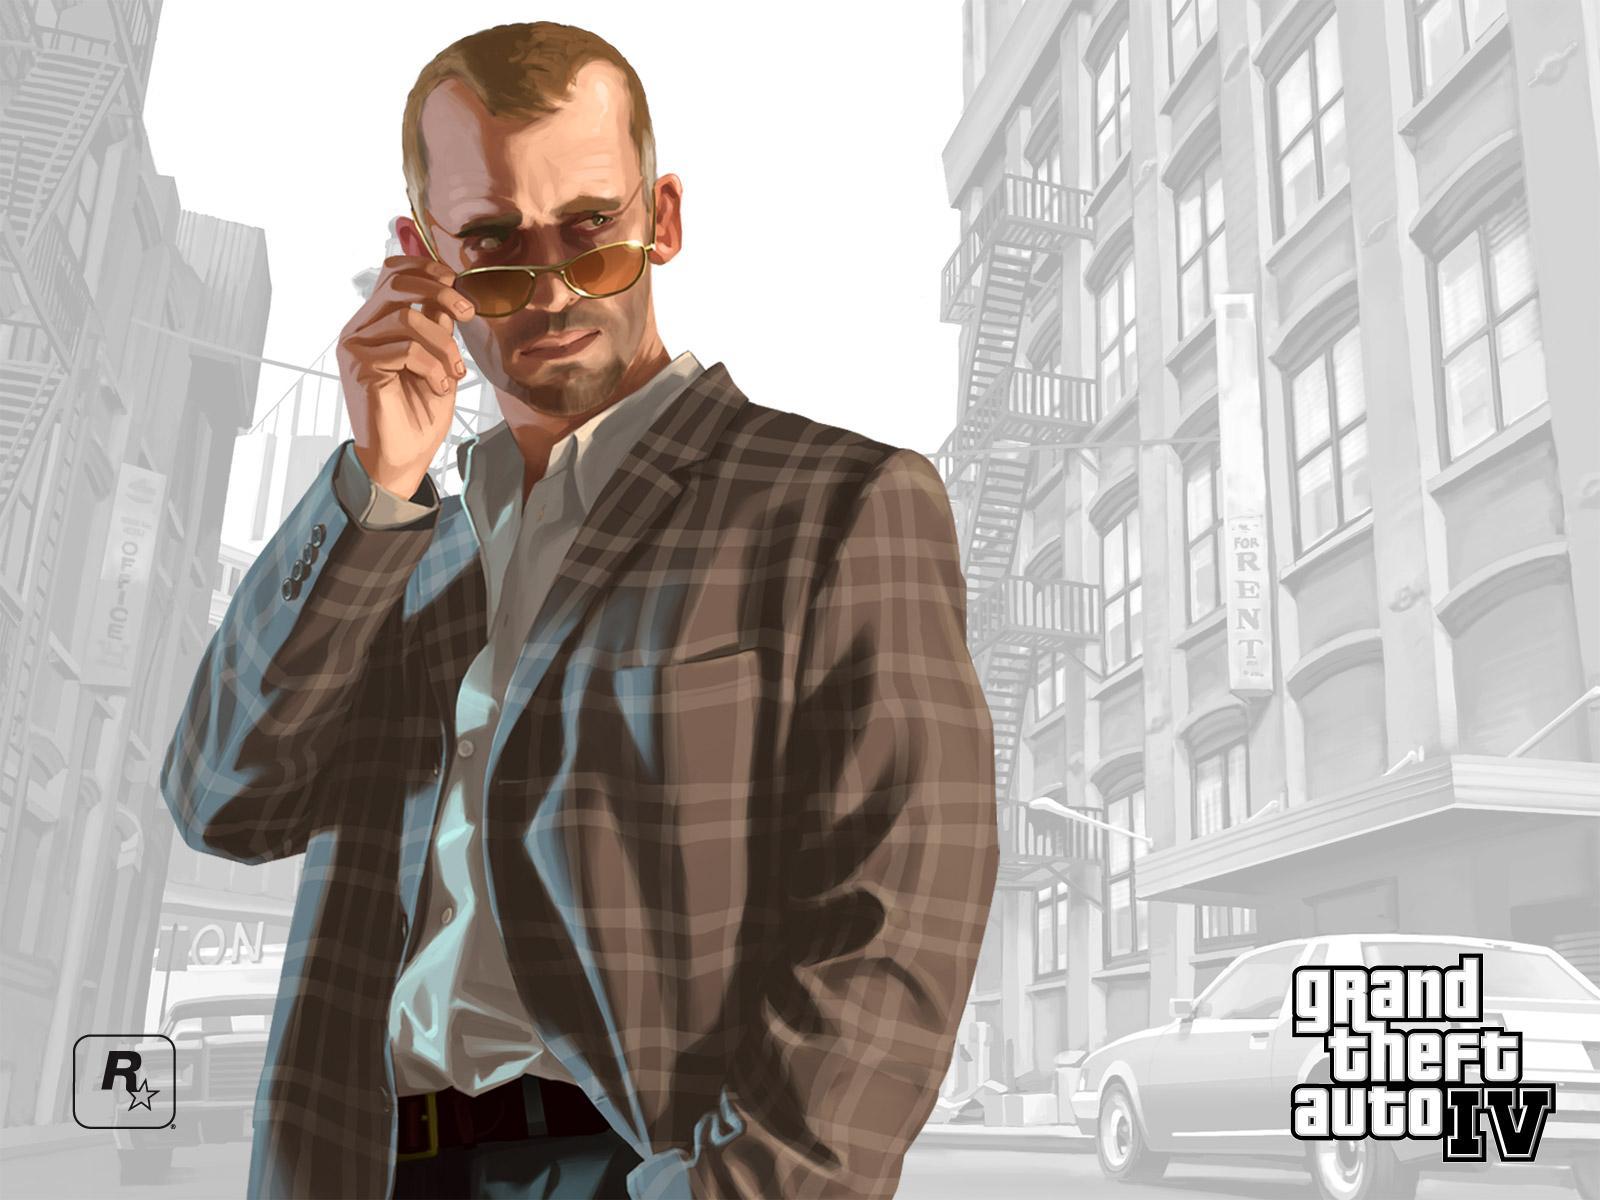 grand_theft_auto_4-15.jpg - Grand Theft Auto 4